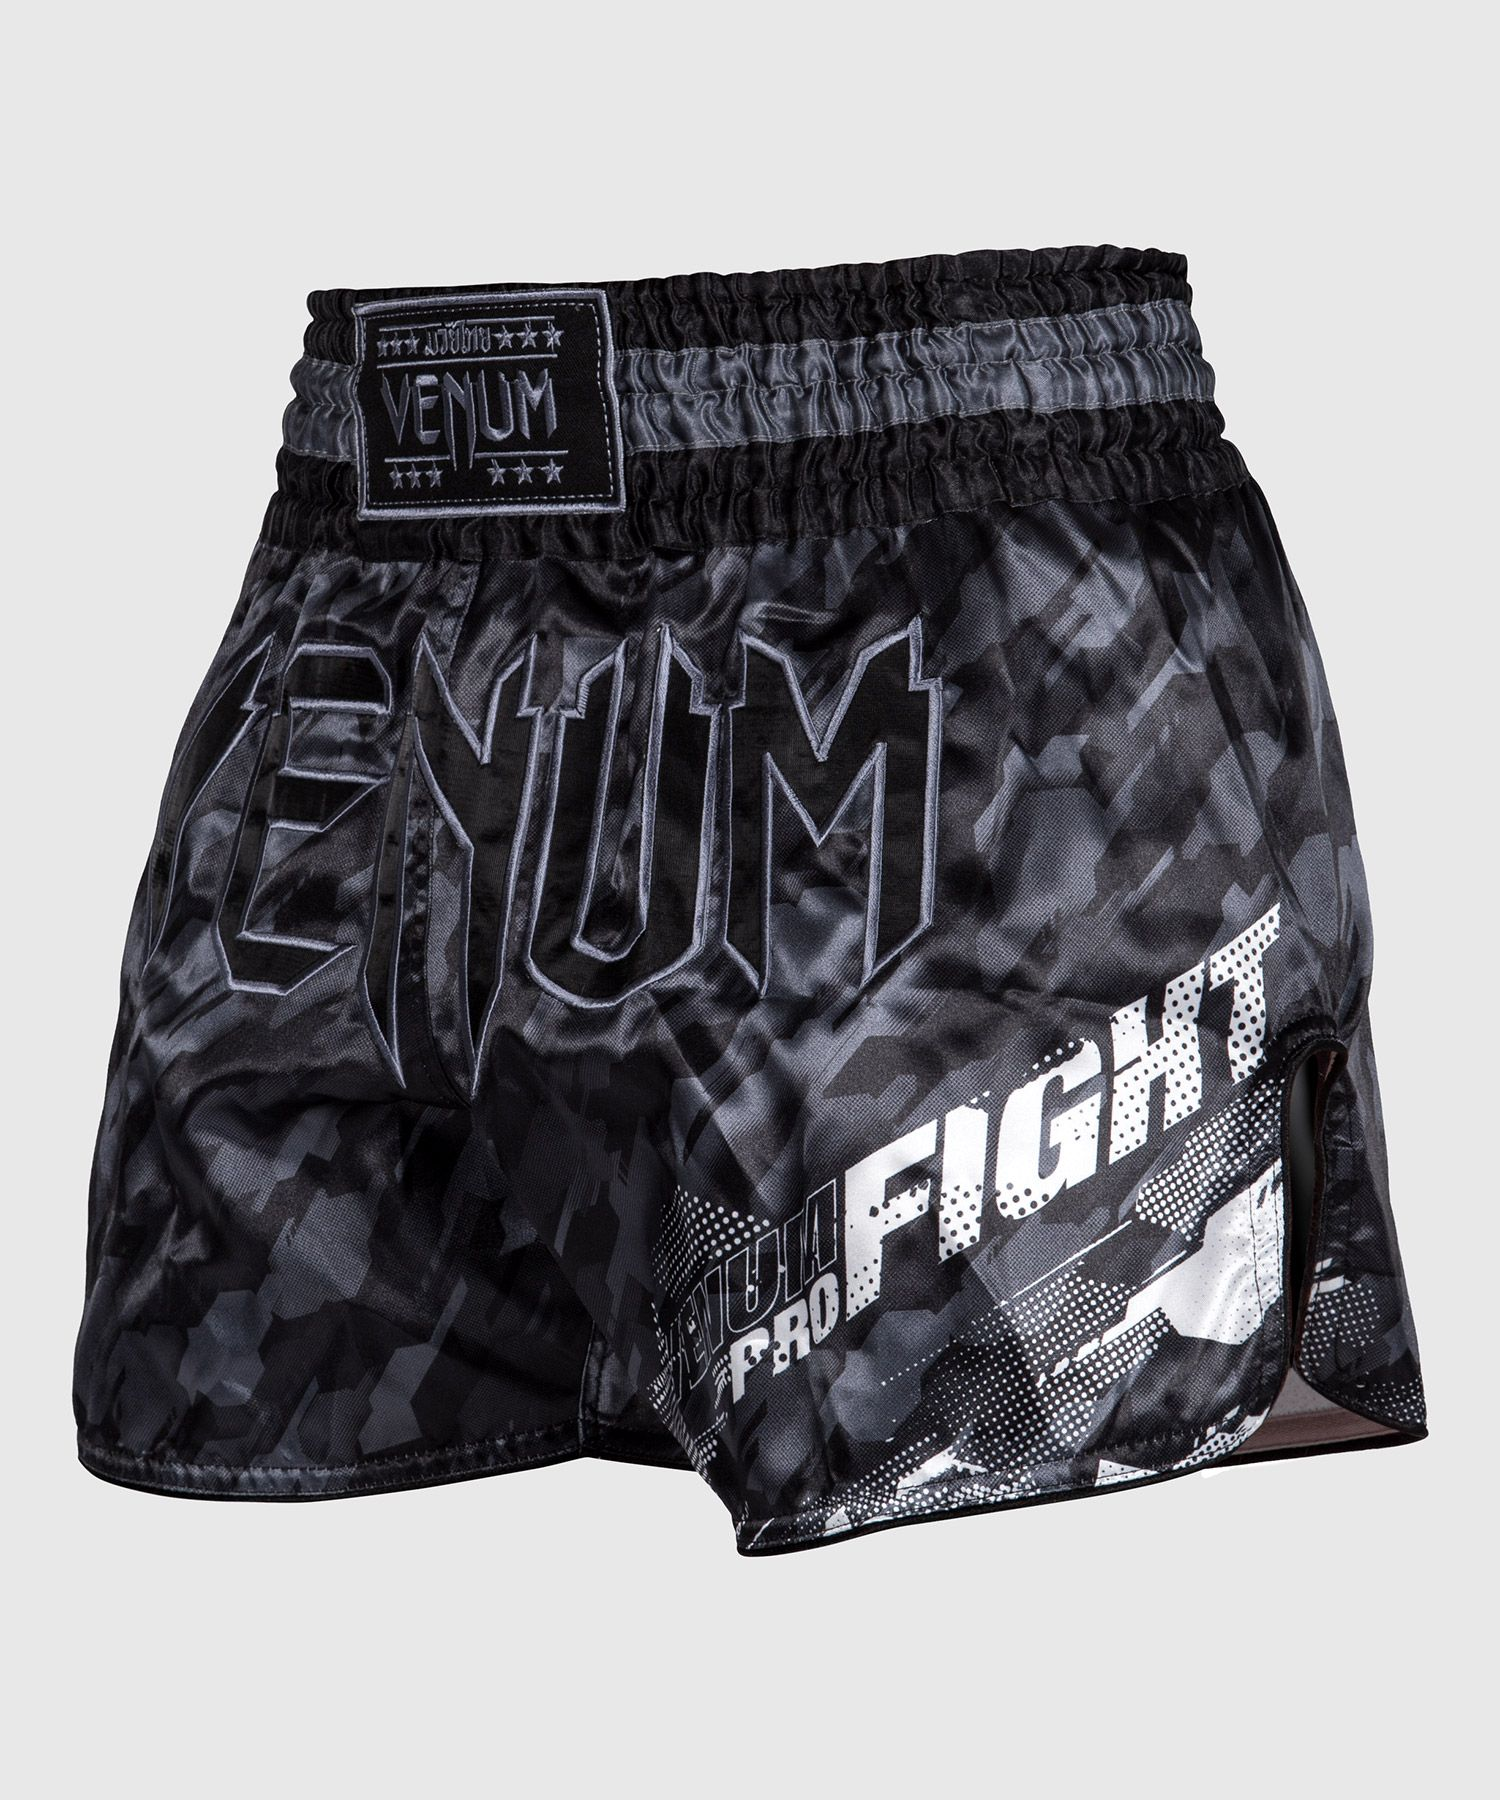 Venum Tecmo Muay Thai Short - Donkergrijs